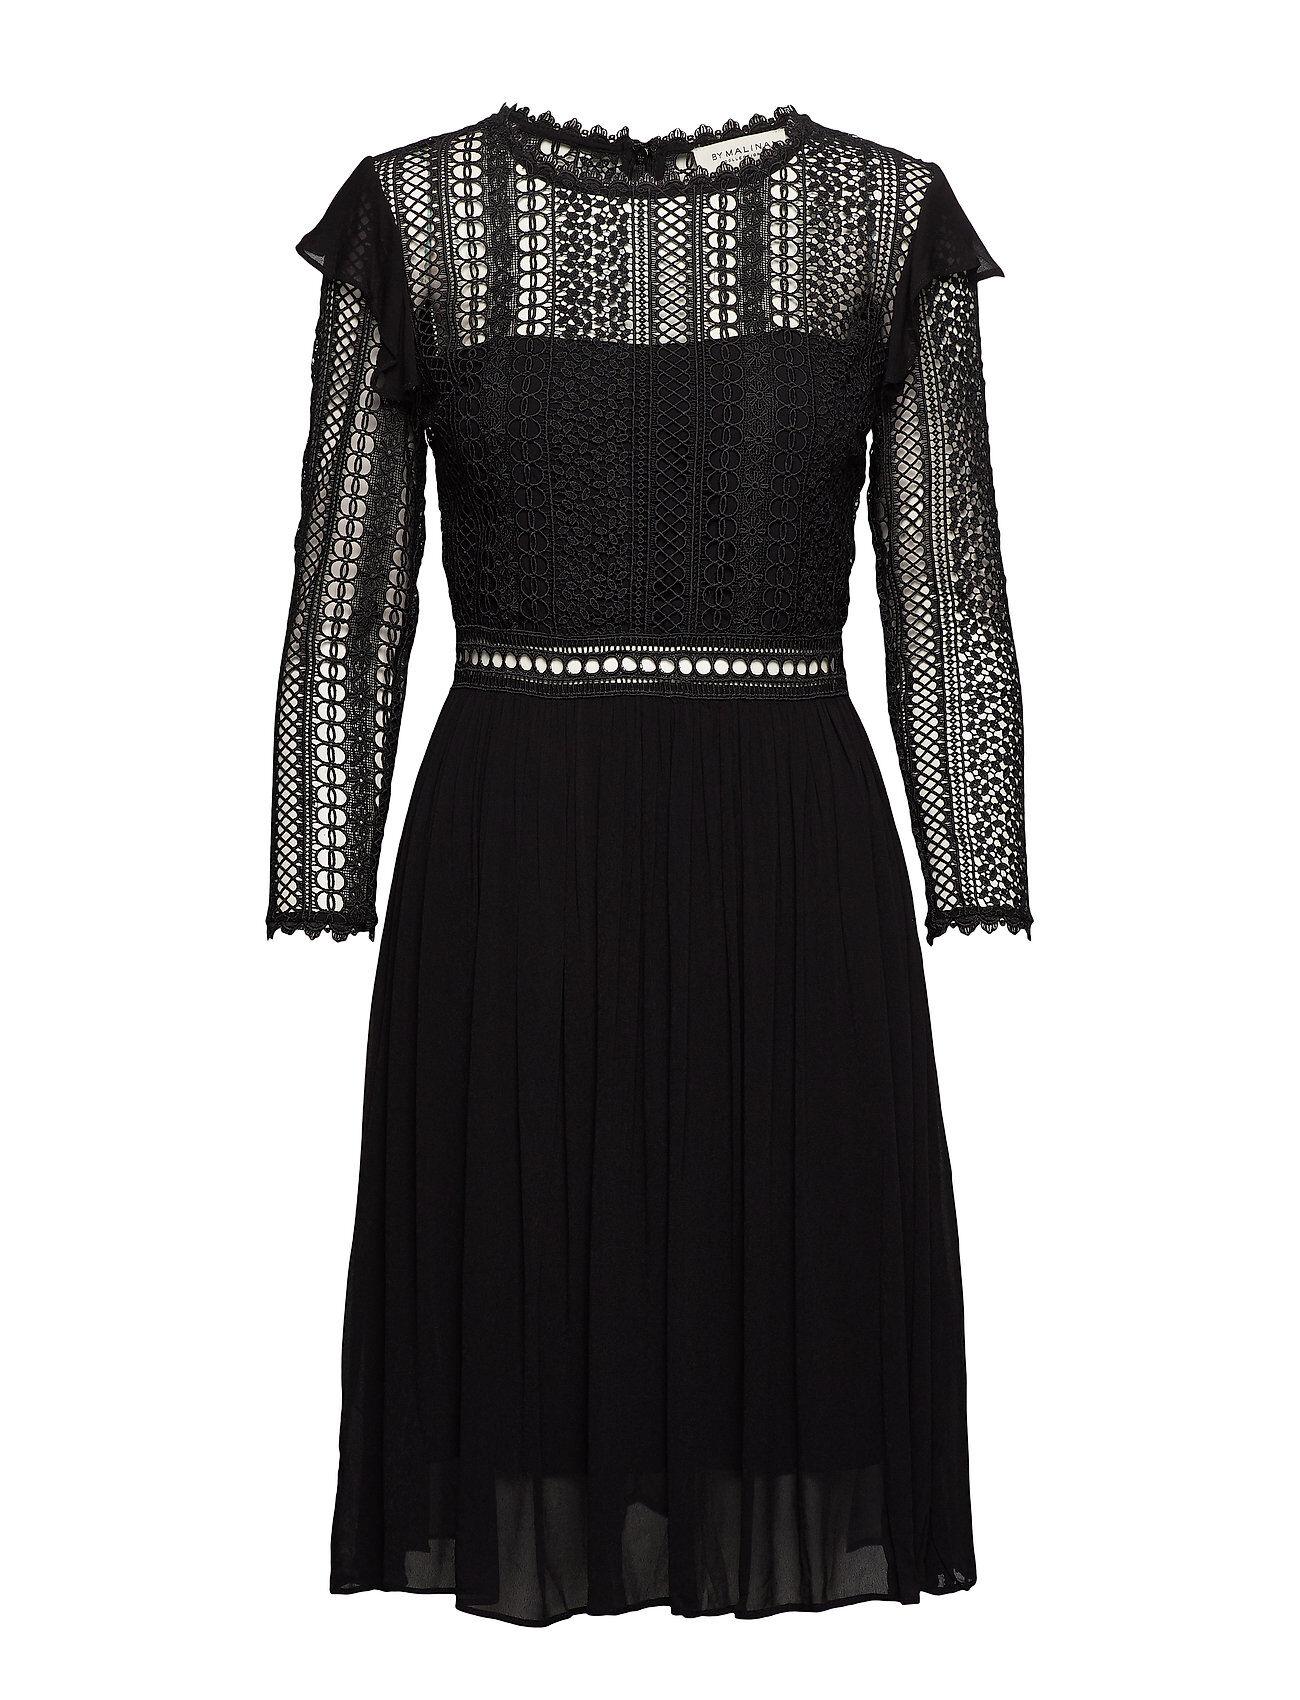 By Malina Marilene Dress Polvipituinen Mekko Musta By Malina